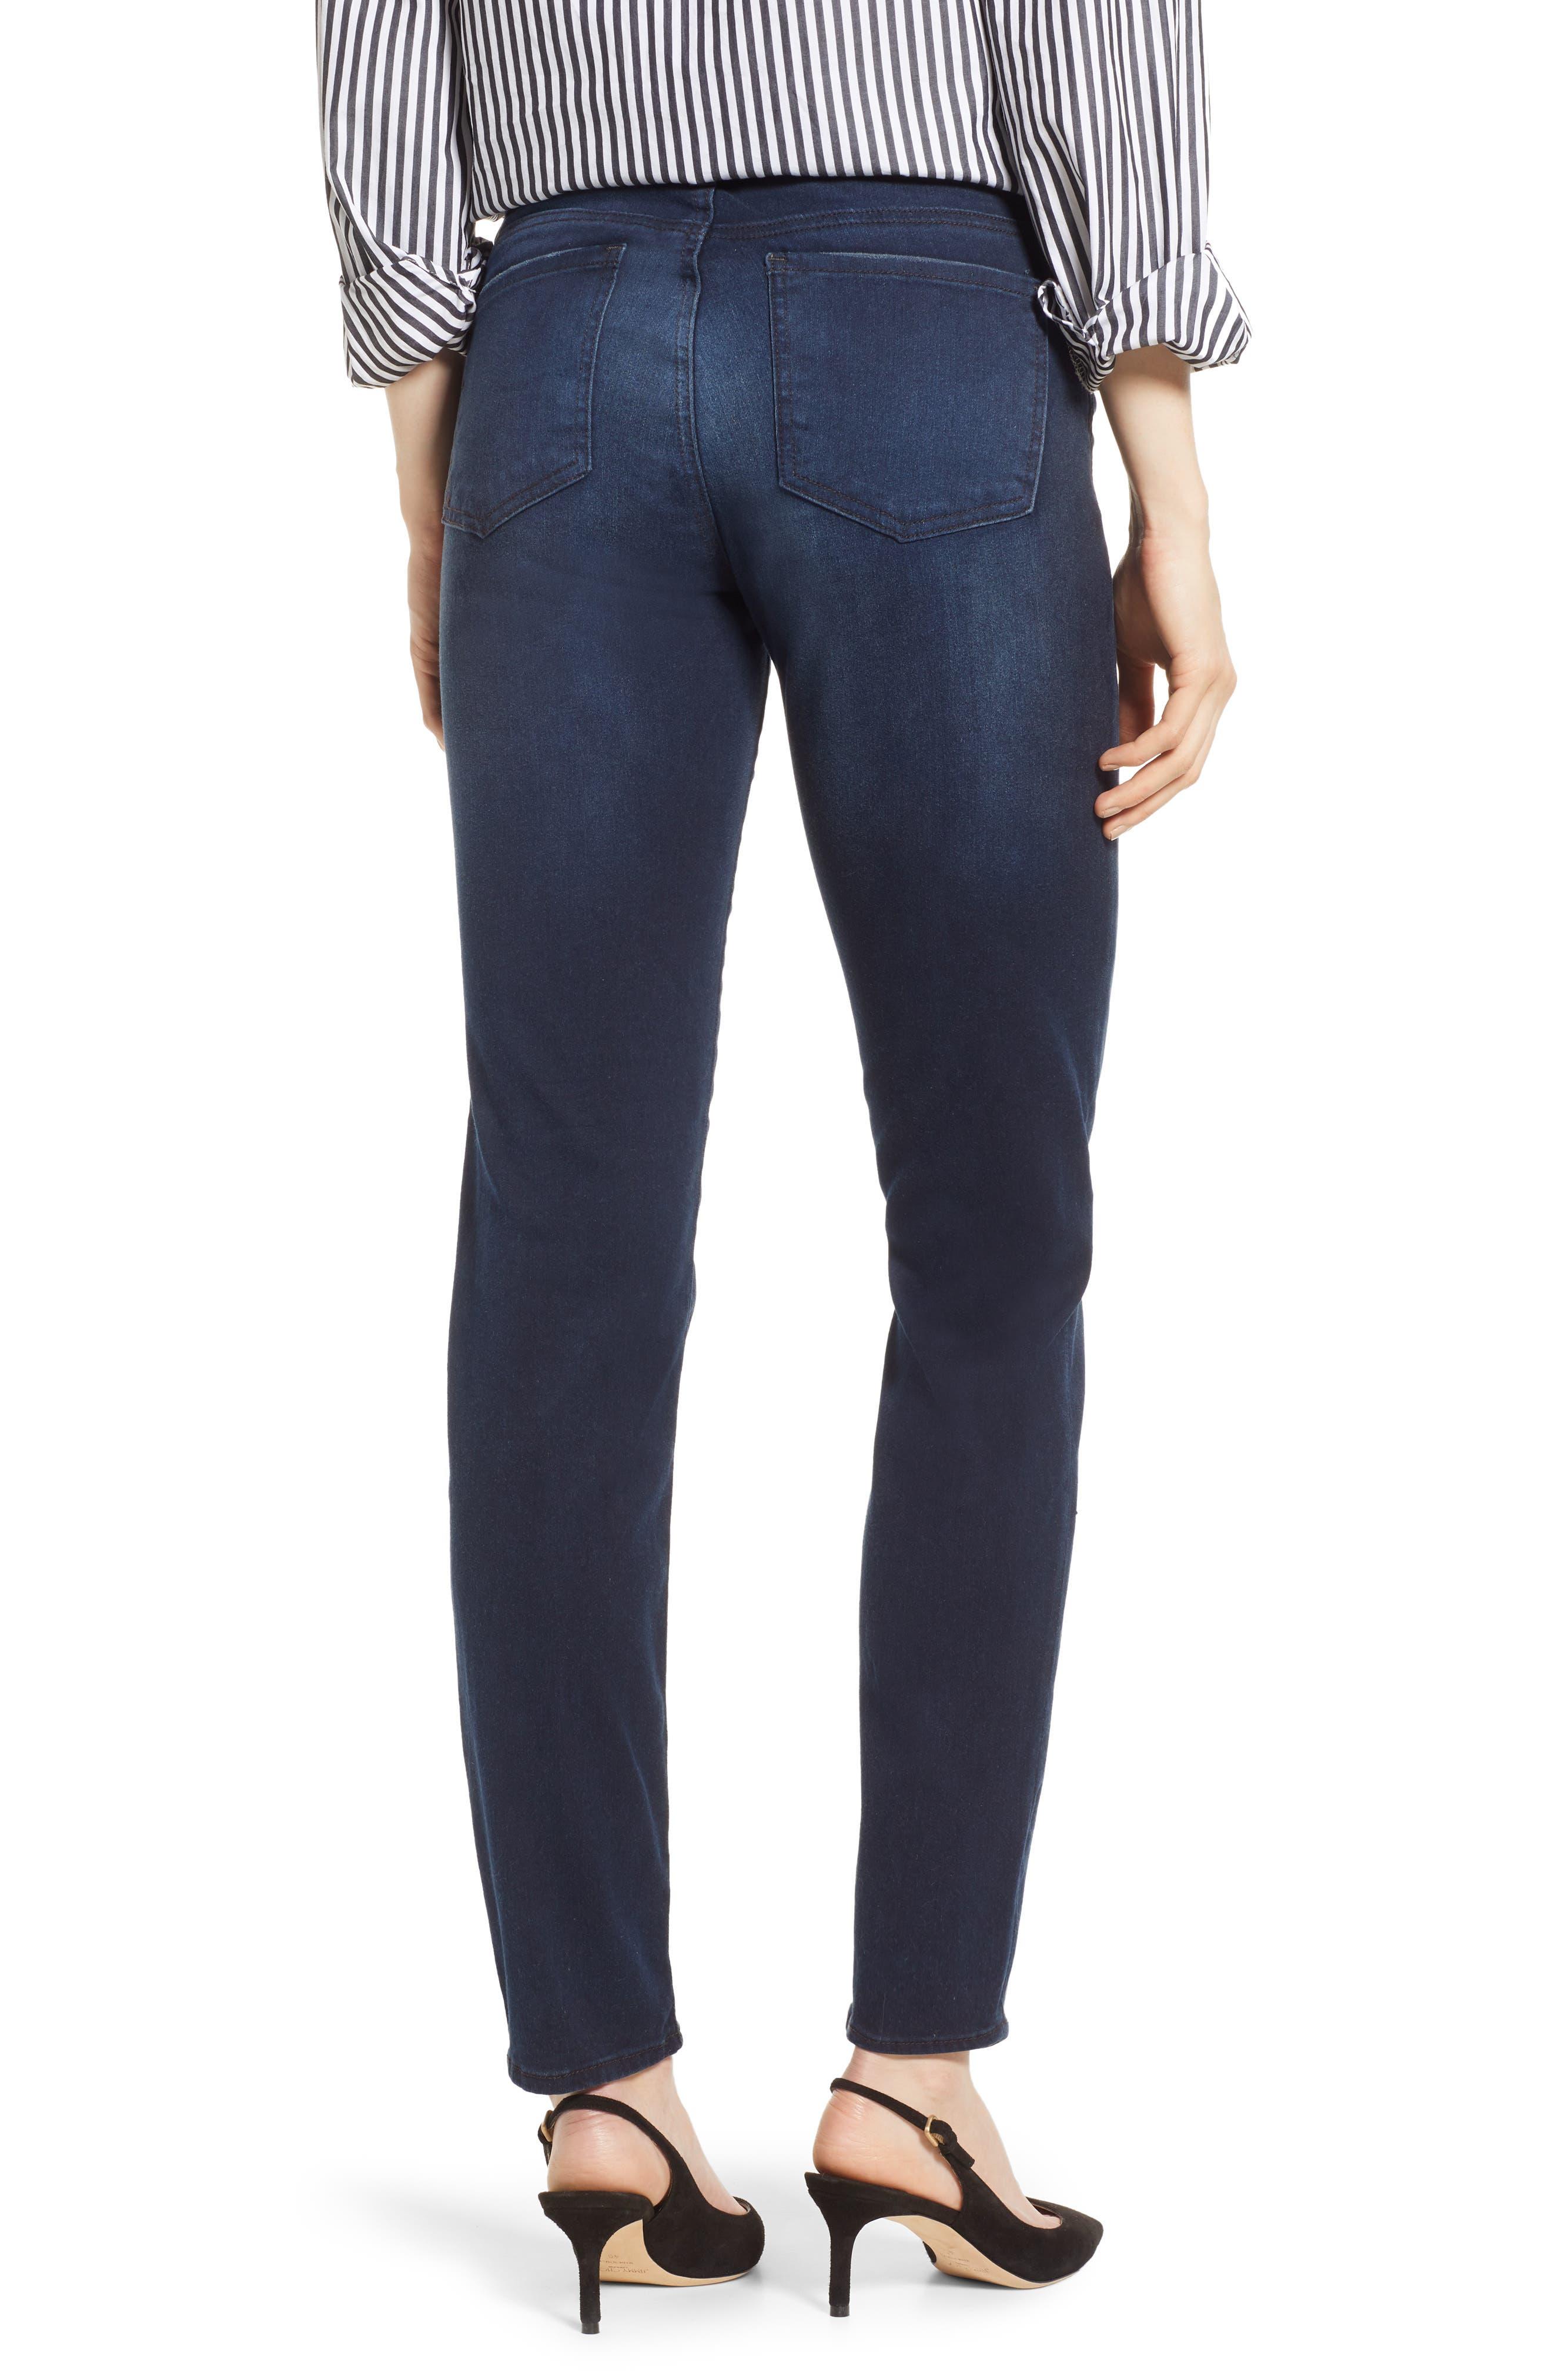 Diana Skinny Jeans,                             Alternate thumbnail 2, color,                             ART W/ EURO BASE WASH